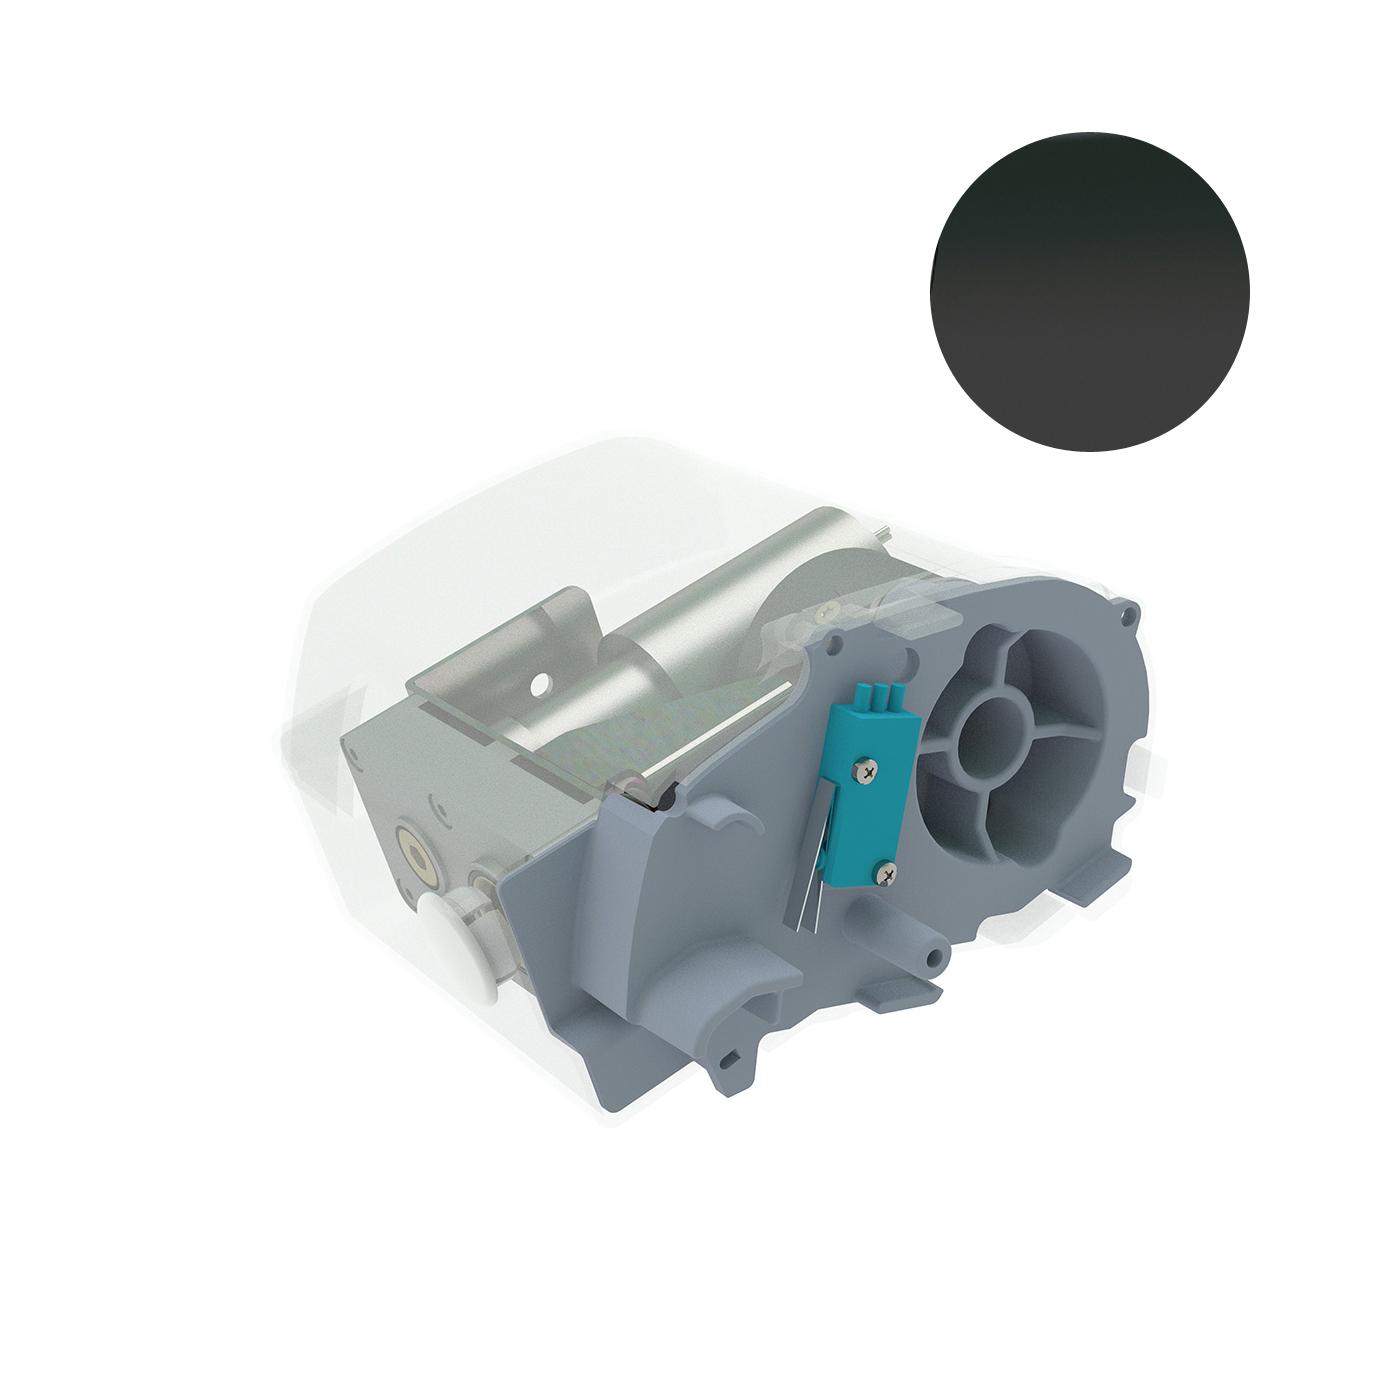 Fiamma Motor Kit Compact F80S 12V deep black